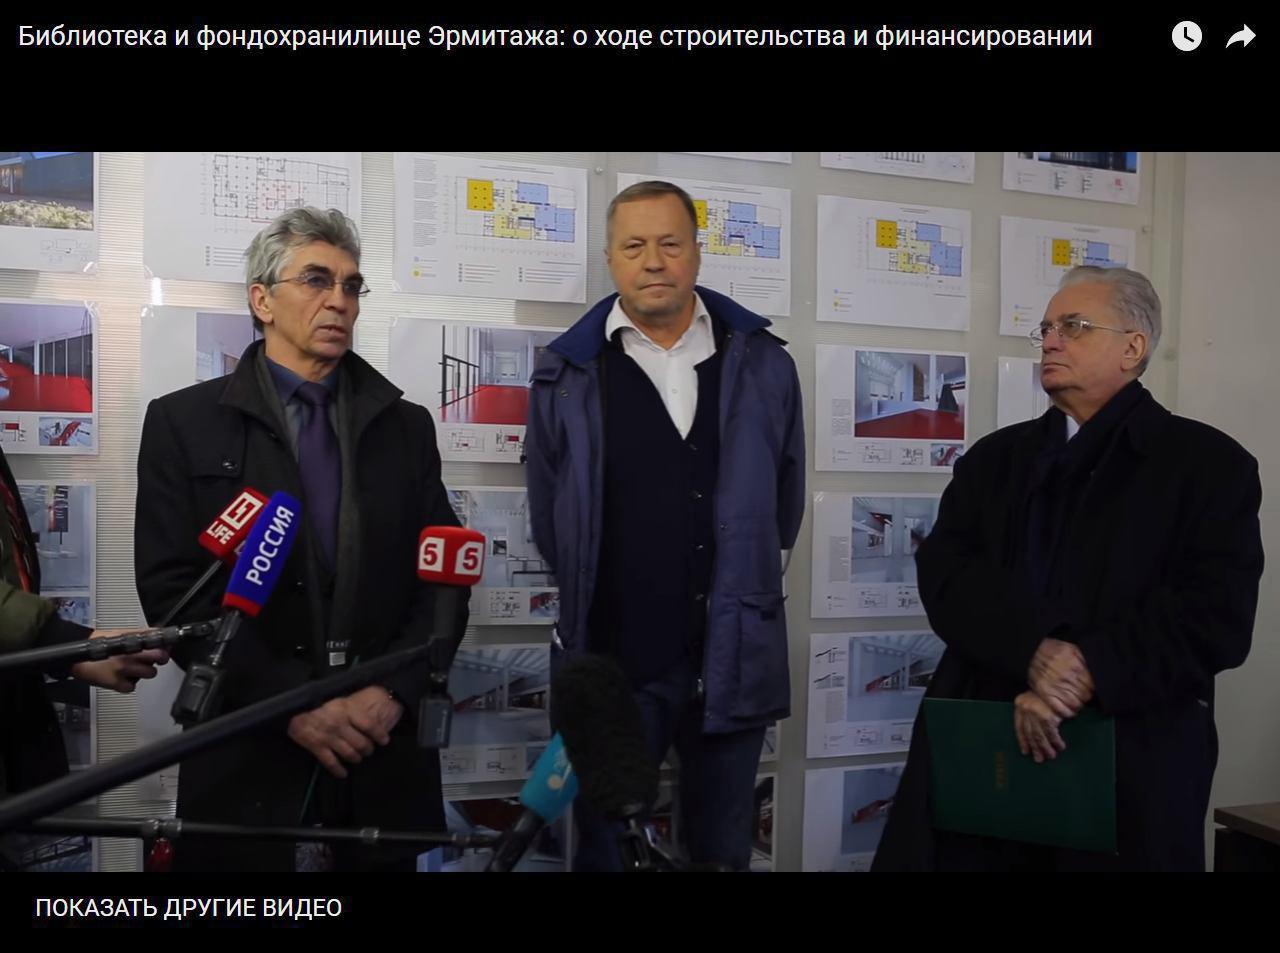 Рогов, Новиков, Пиотровский